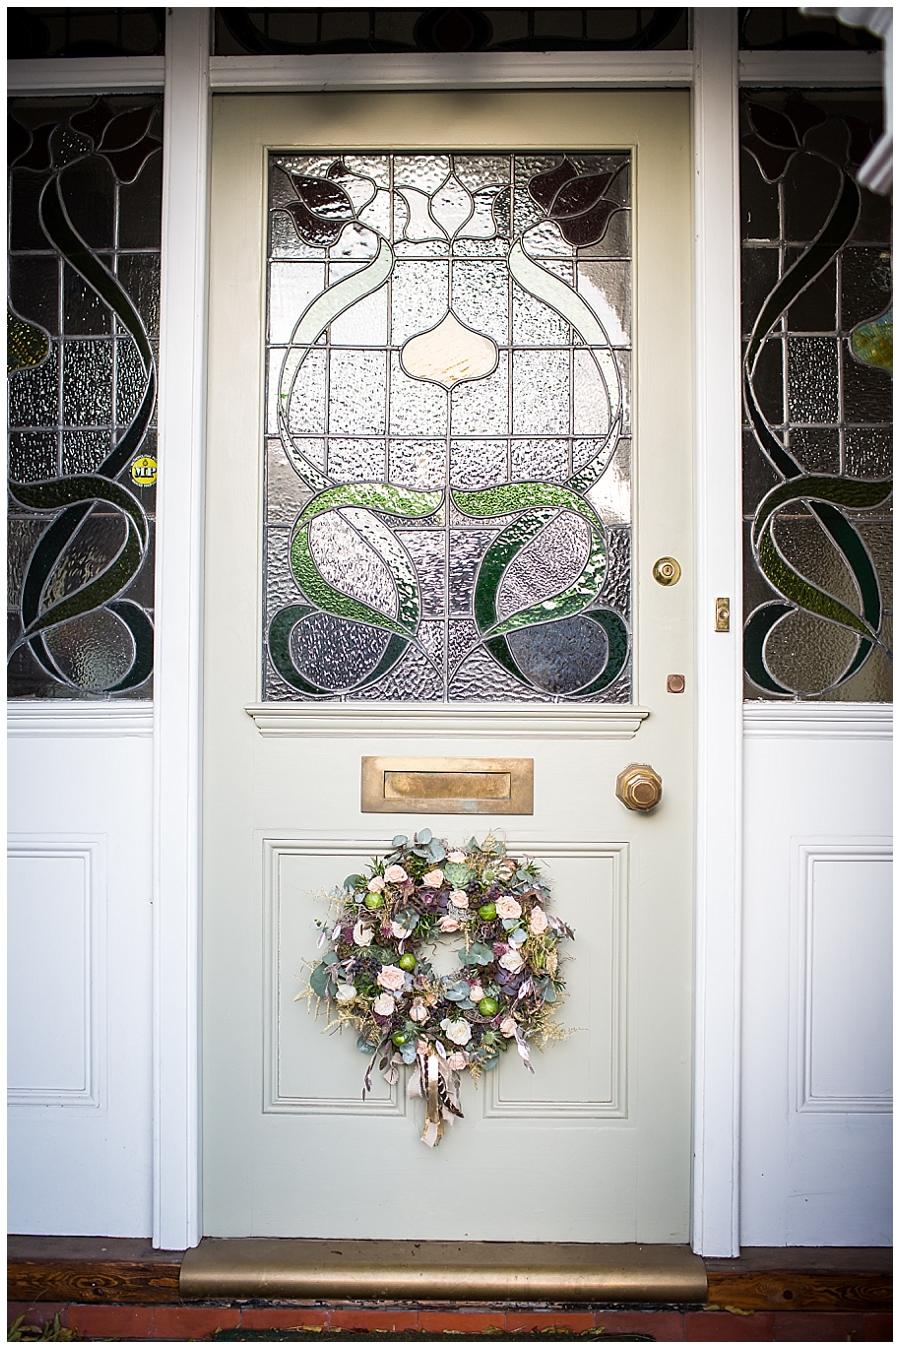 Kate Avery Flowers Christmas Wreath Workshop at Millbridge Court